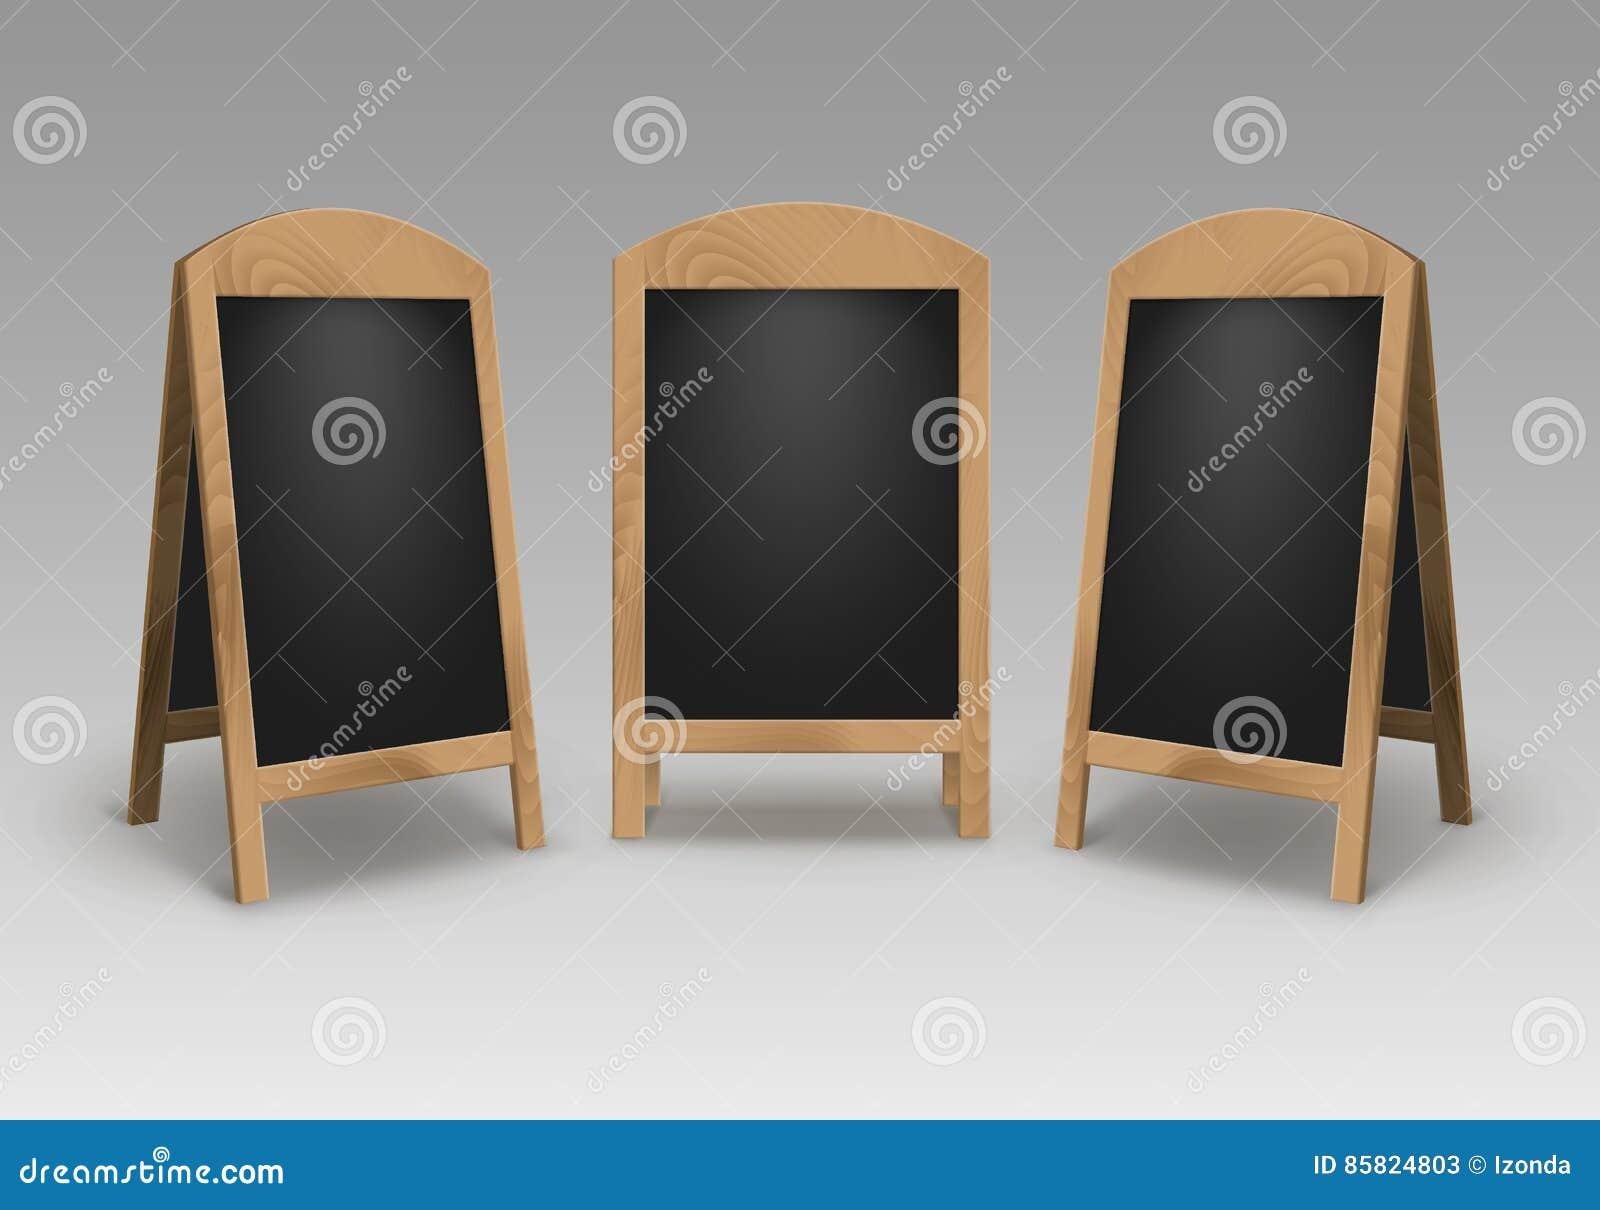 Vector Set Of Wooden Empty Blank Advertising Street Sandwich Stands